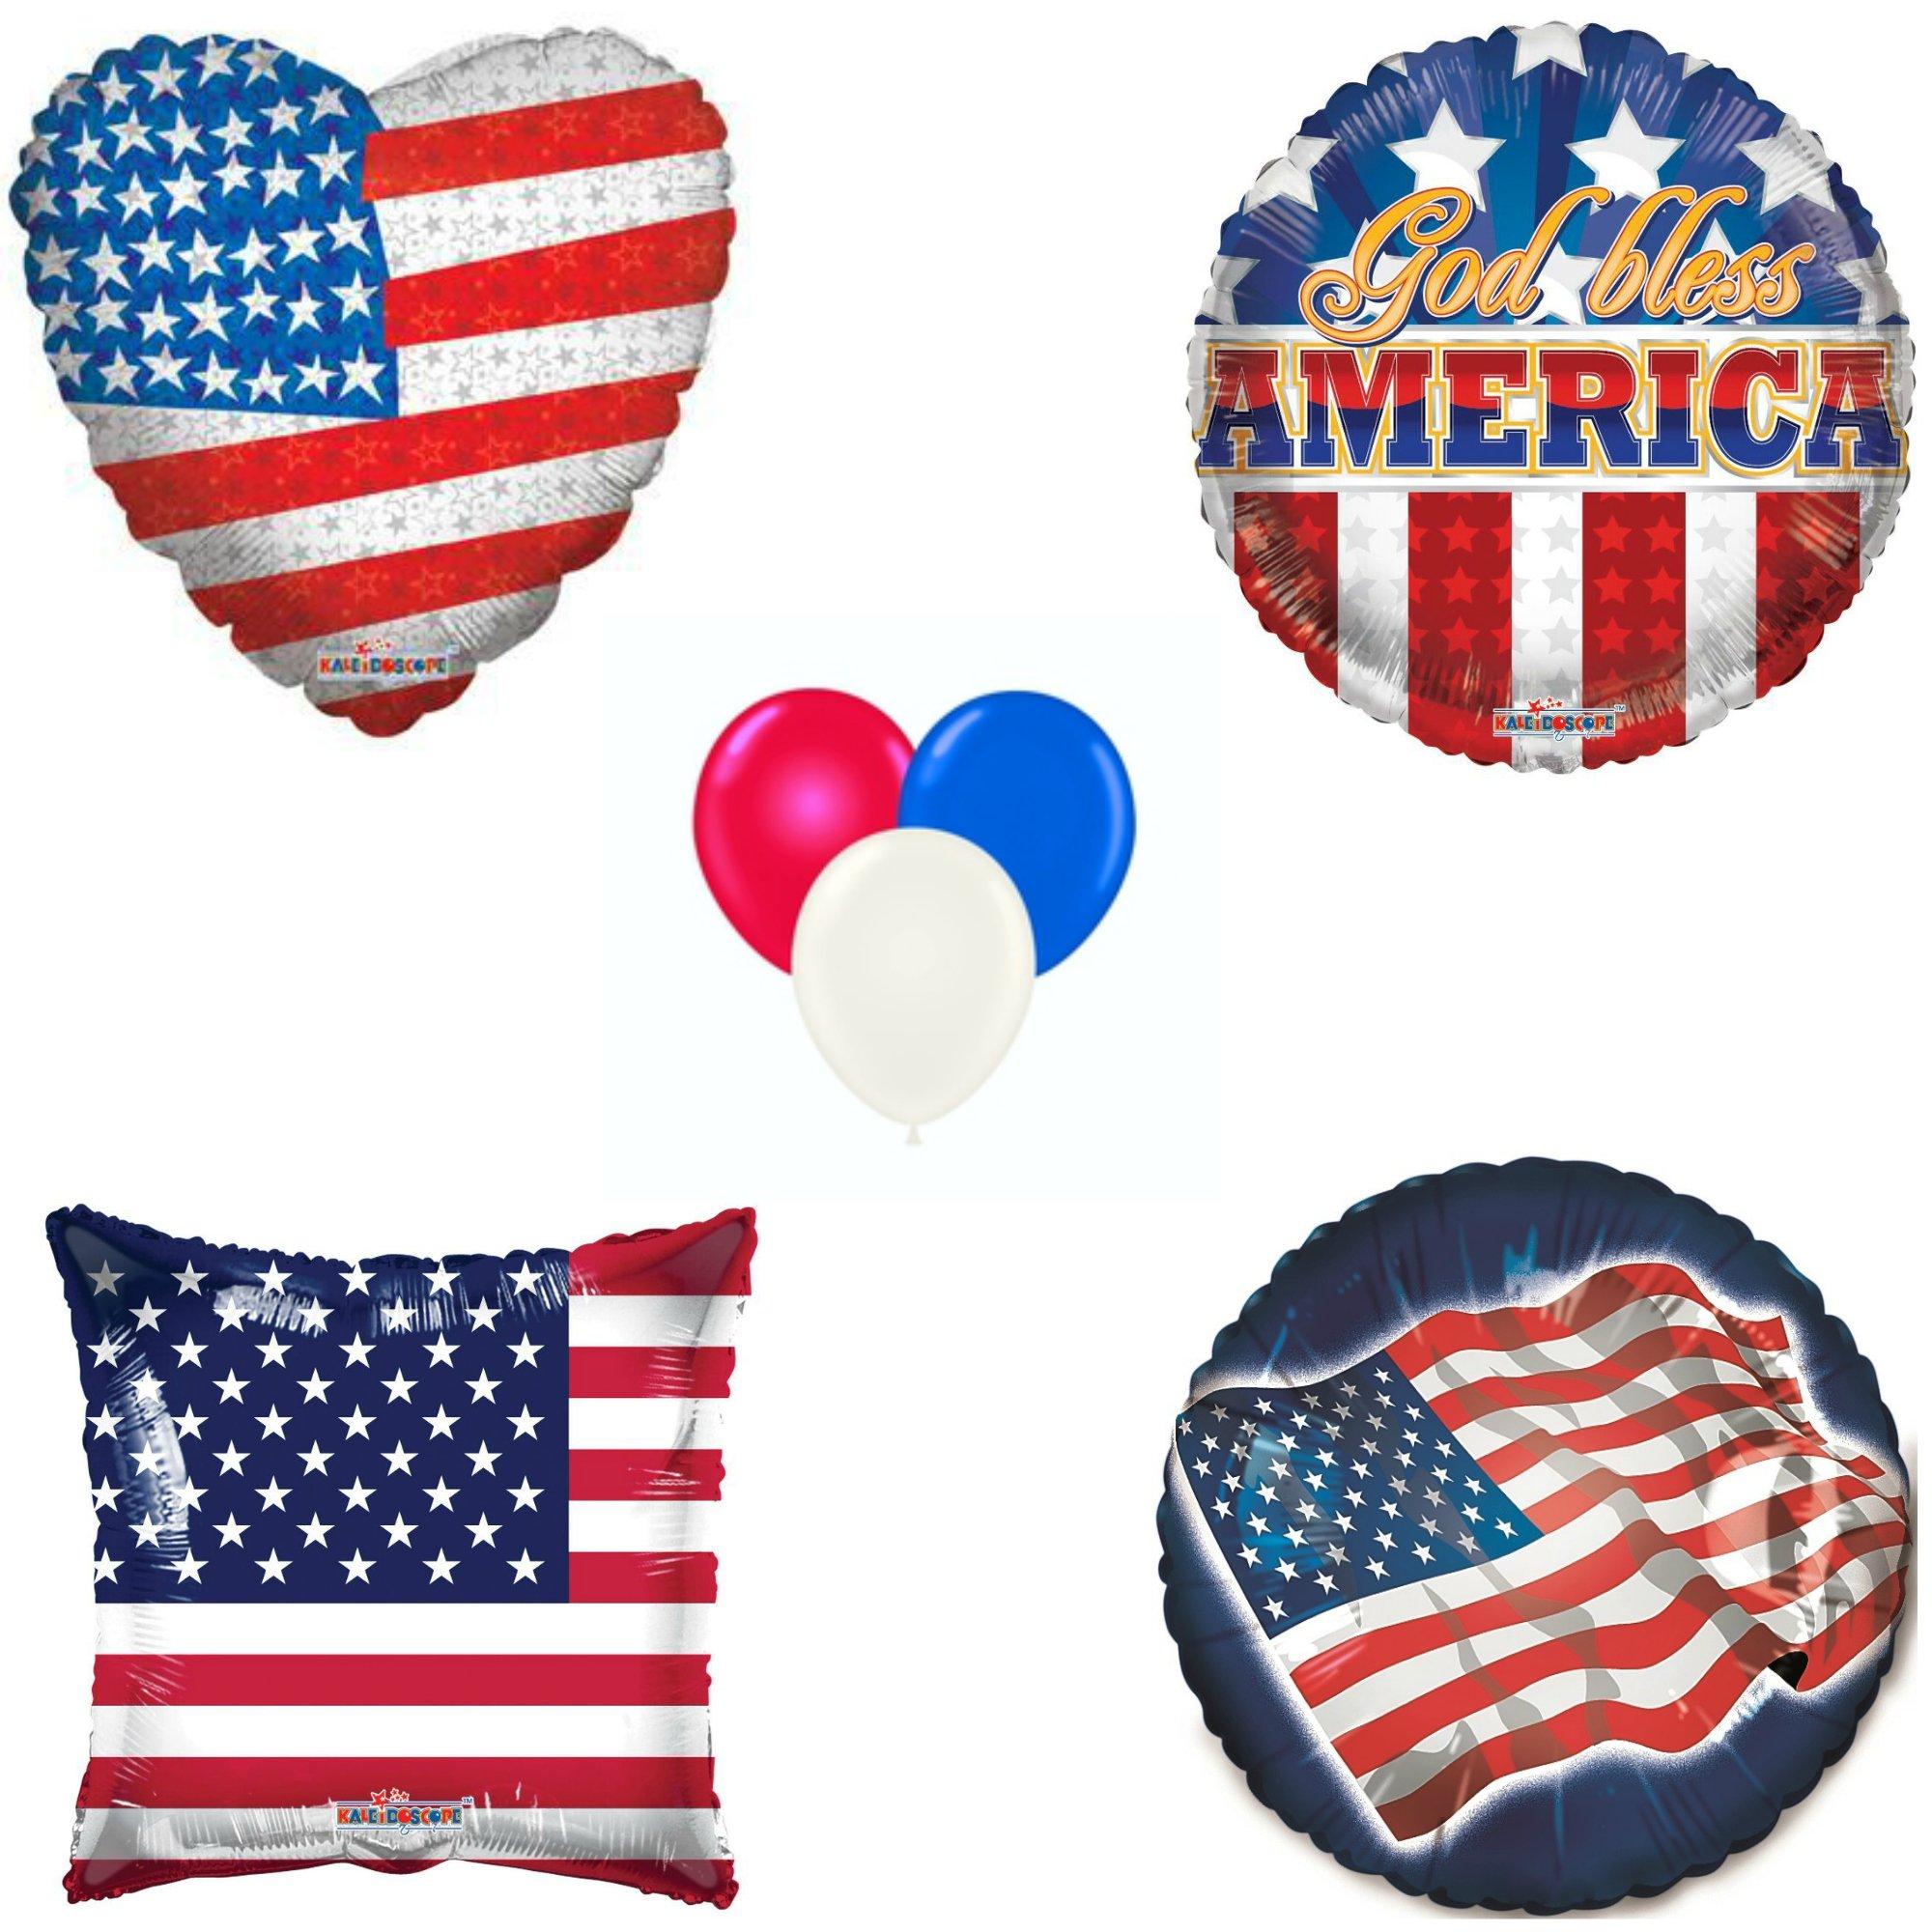 Patriotic Balloons Bundle - One 18'' Foil Heart Flag, One 18'' Foil Circle God Bless America, One 18'' Foil Square Flag, One 18'' Foil Circle Flag & Fifteen 11'' Latex Mix of Red, White & Blue